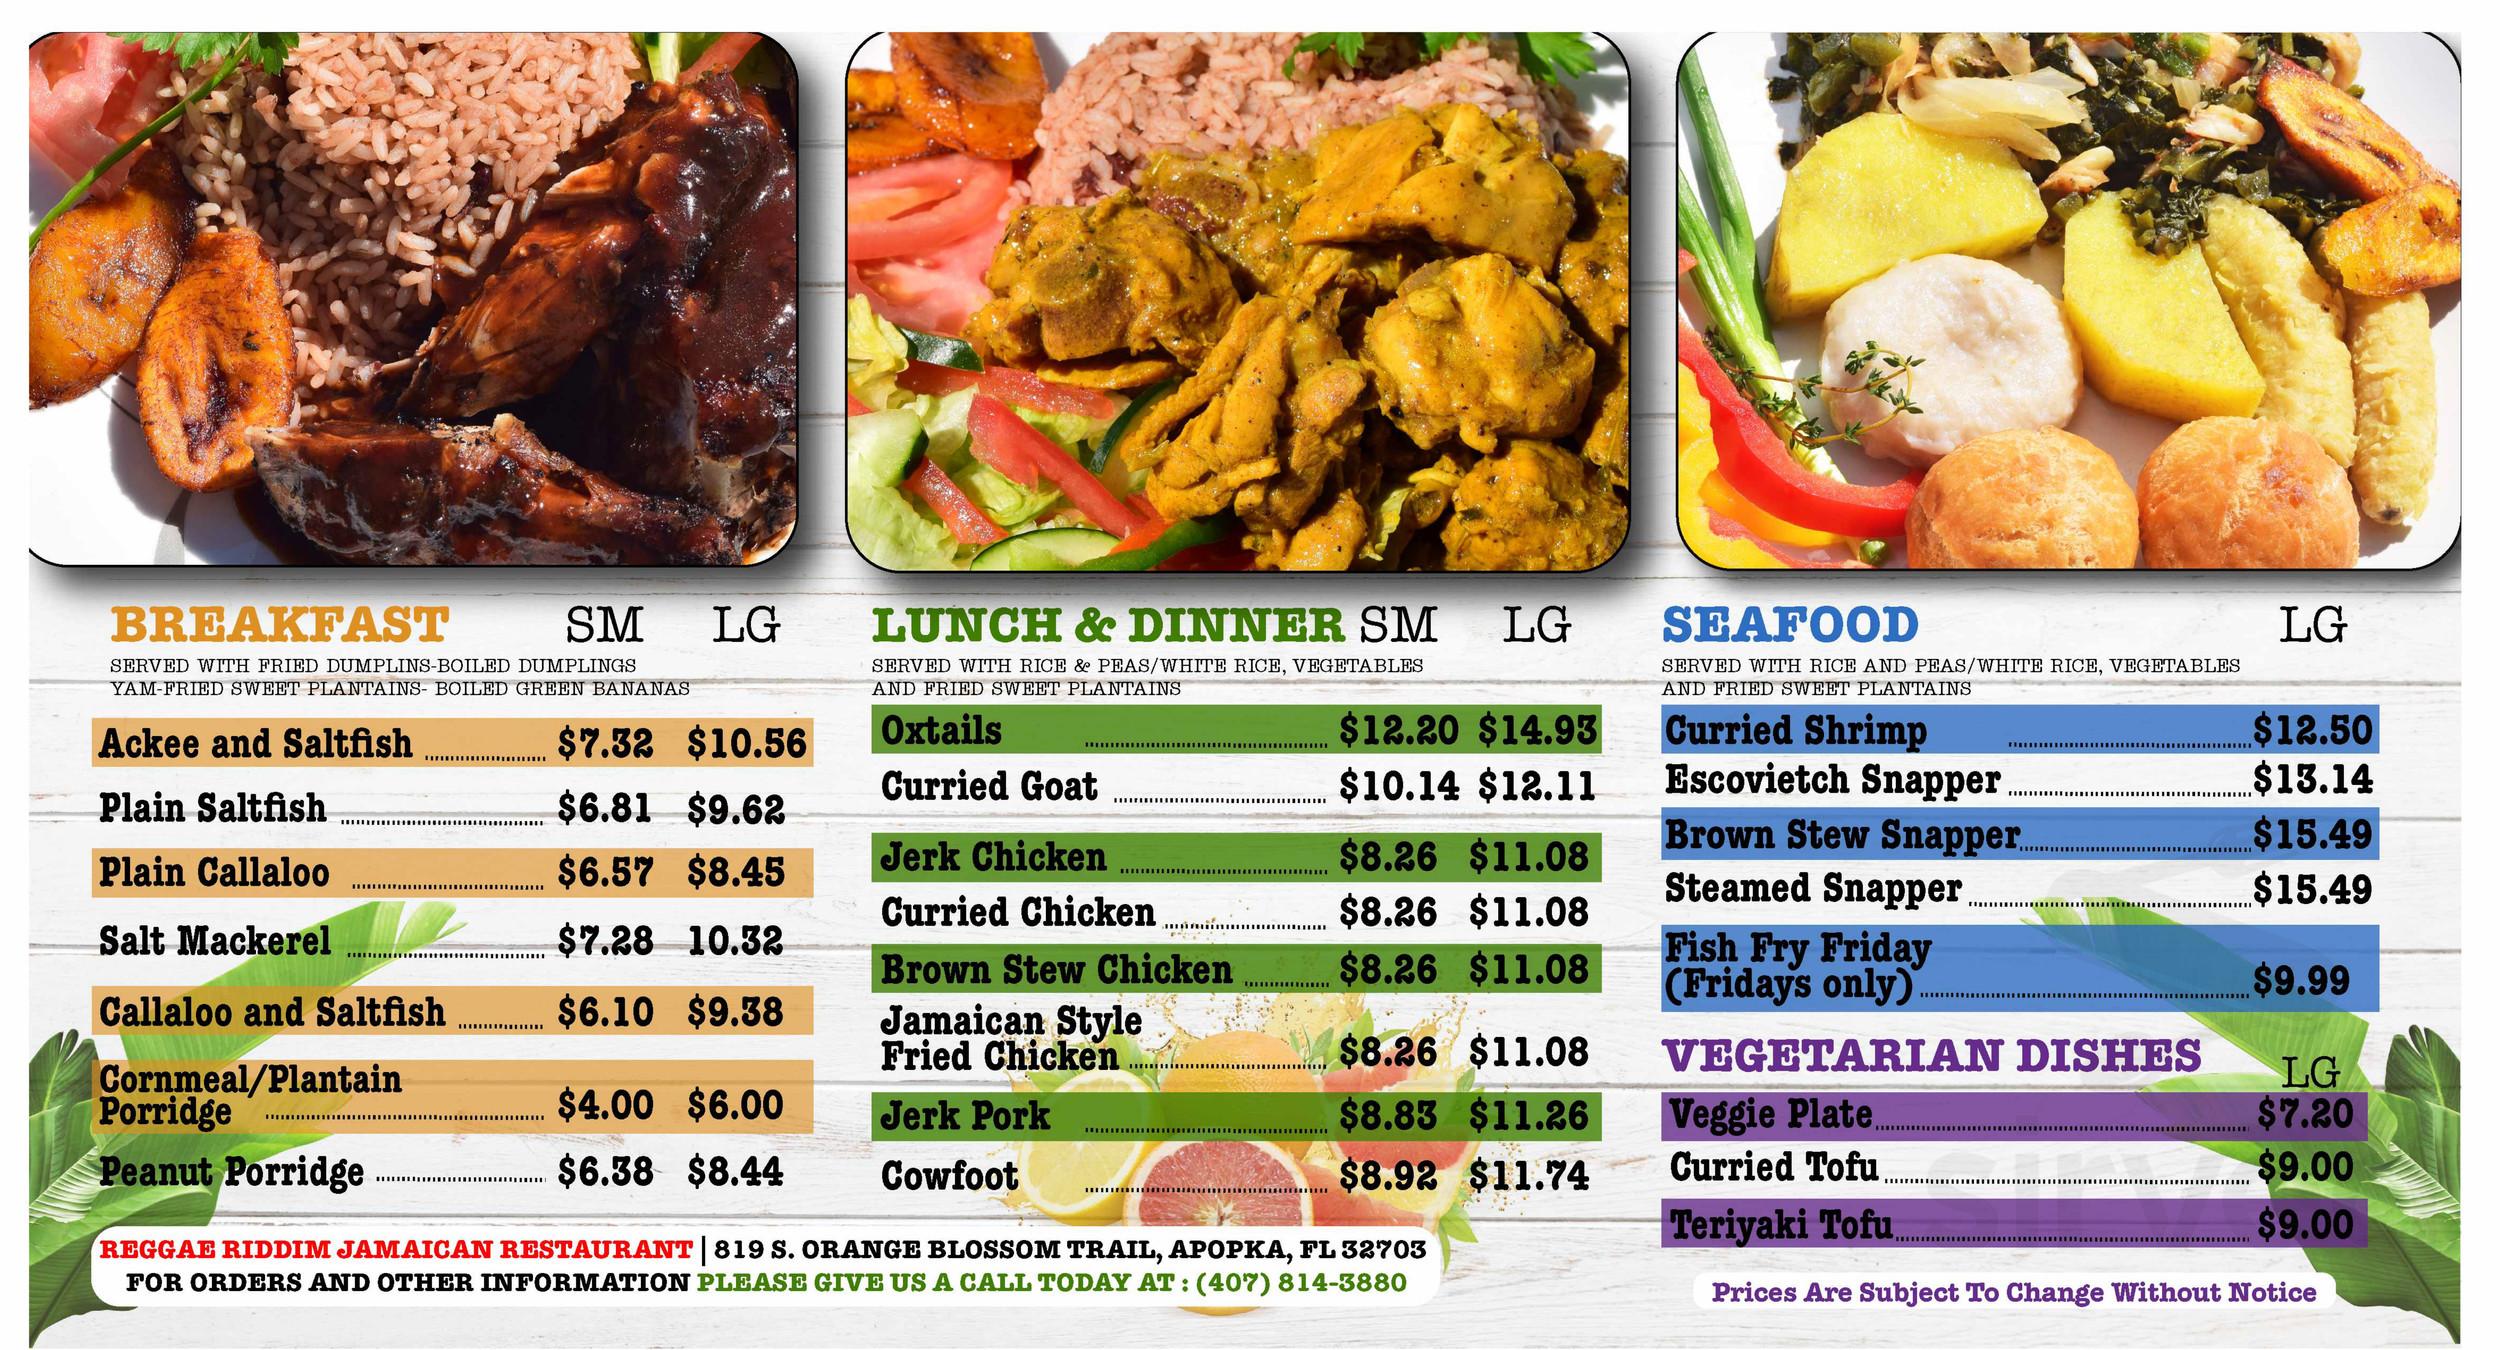 Menu for Reggae Riddim Jamaican Restaurant LLC  in Apopka